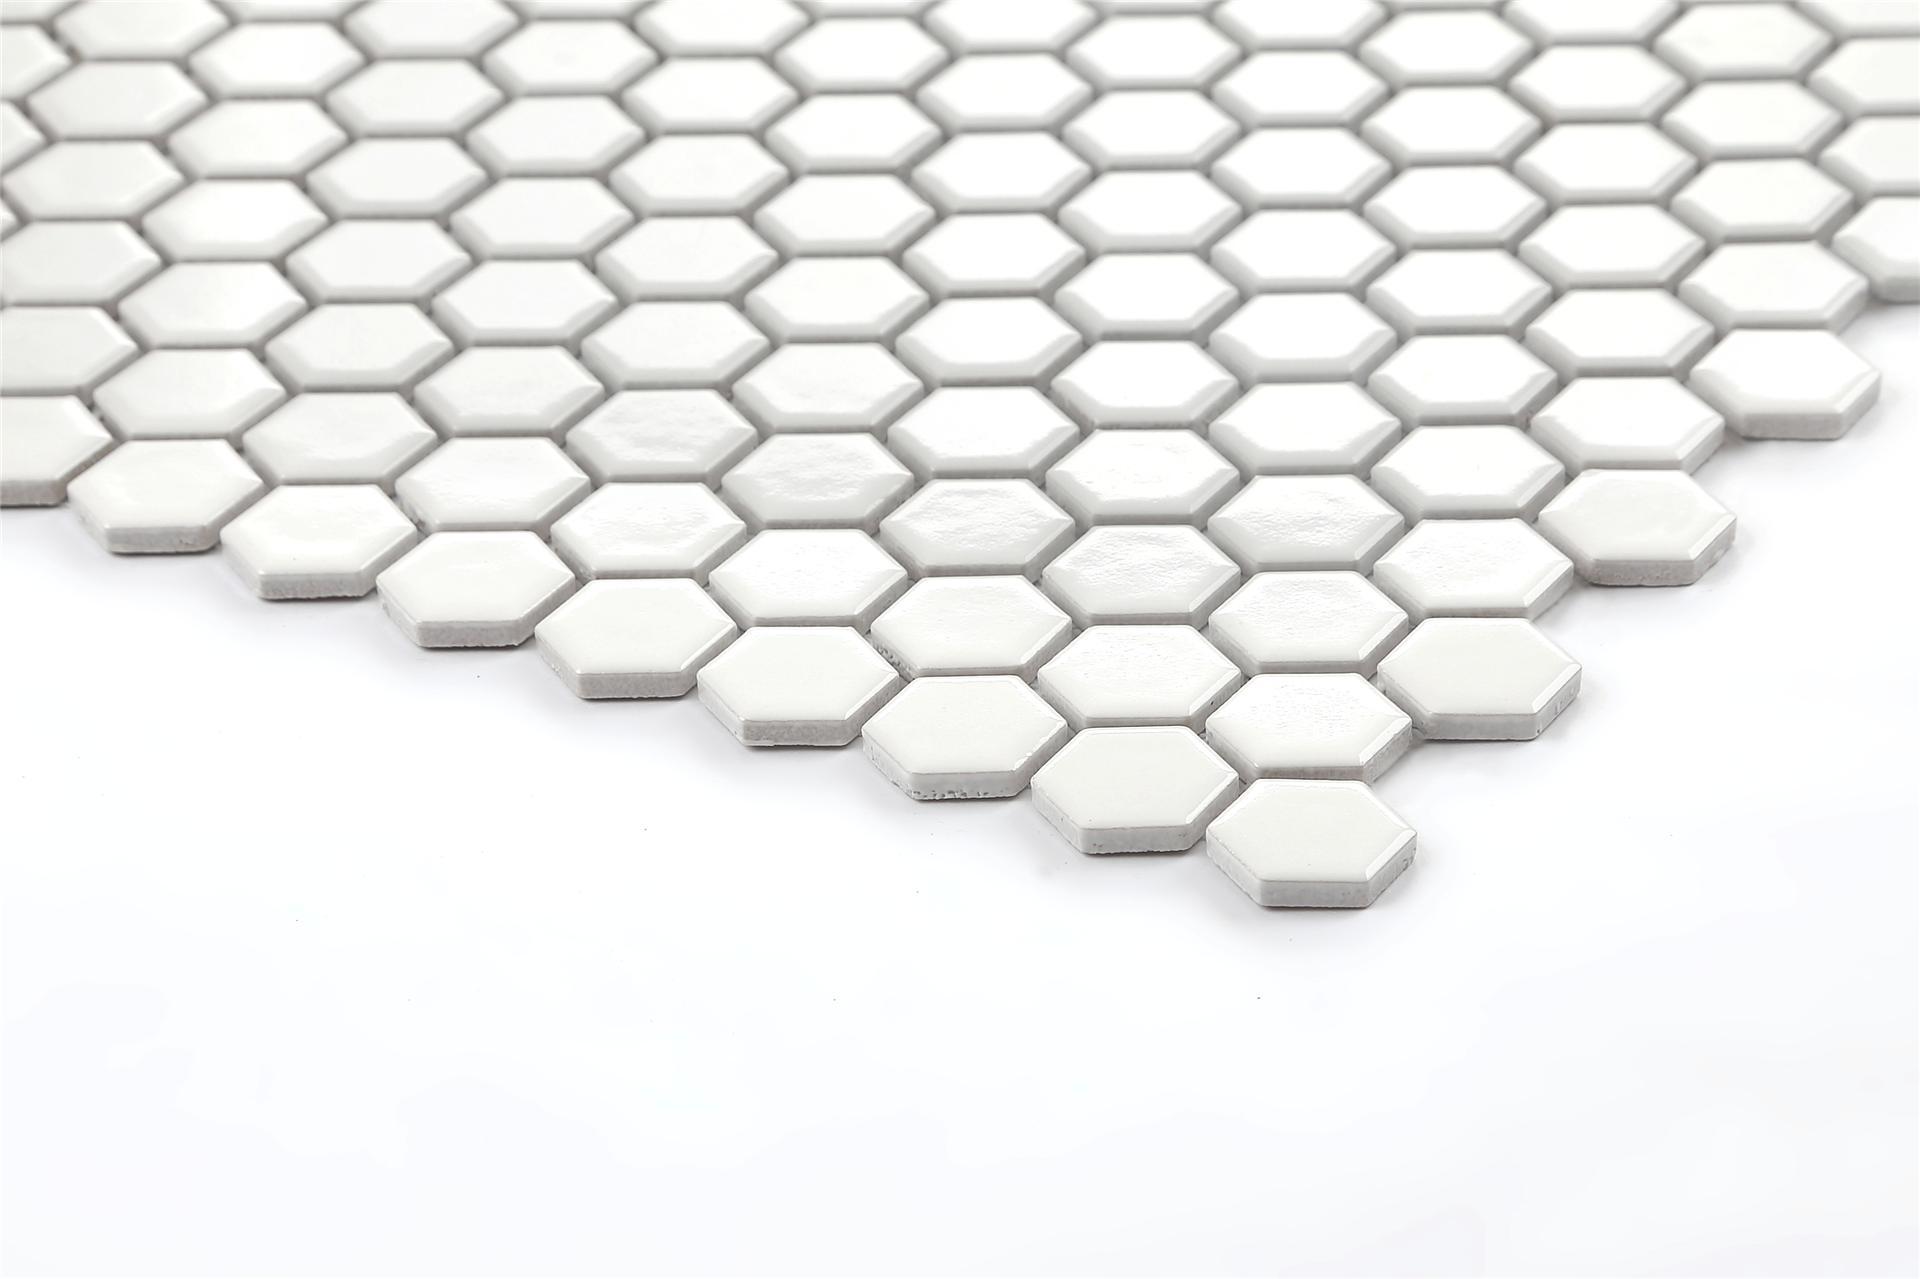 cheap kitchen sink and tap sets backsplash cost 1 sq m white hexagonal gloss ceramic mosaic wall & floor ...